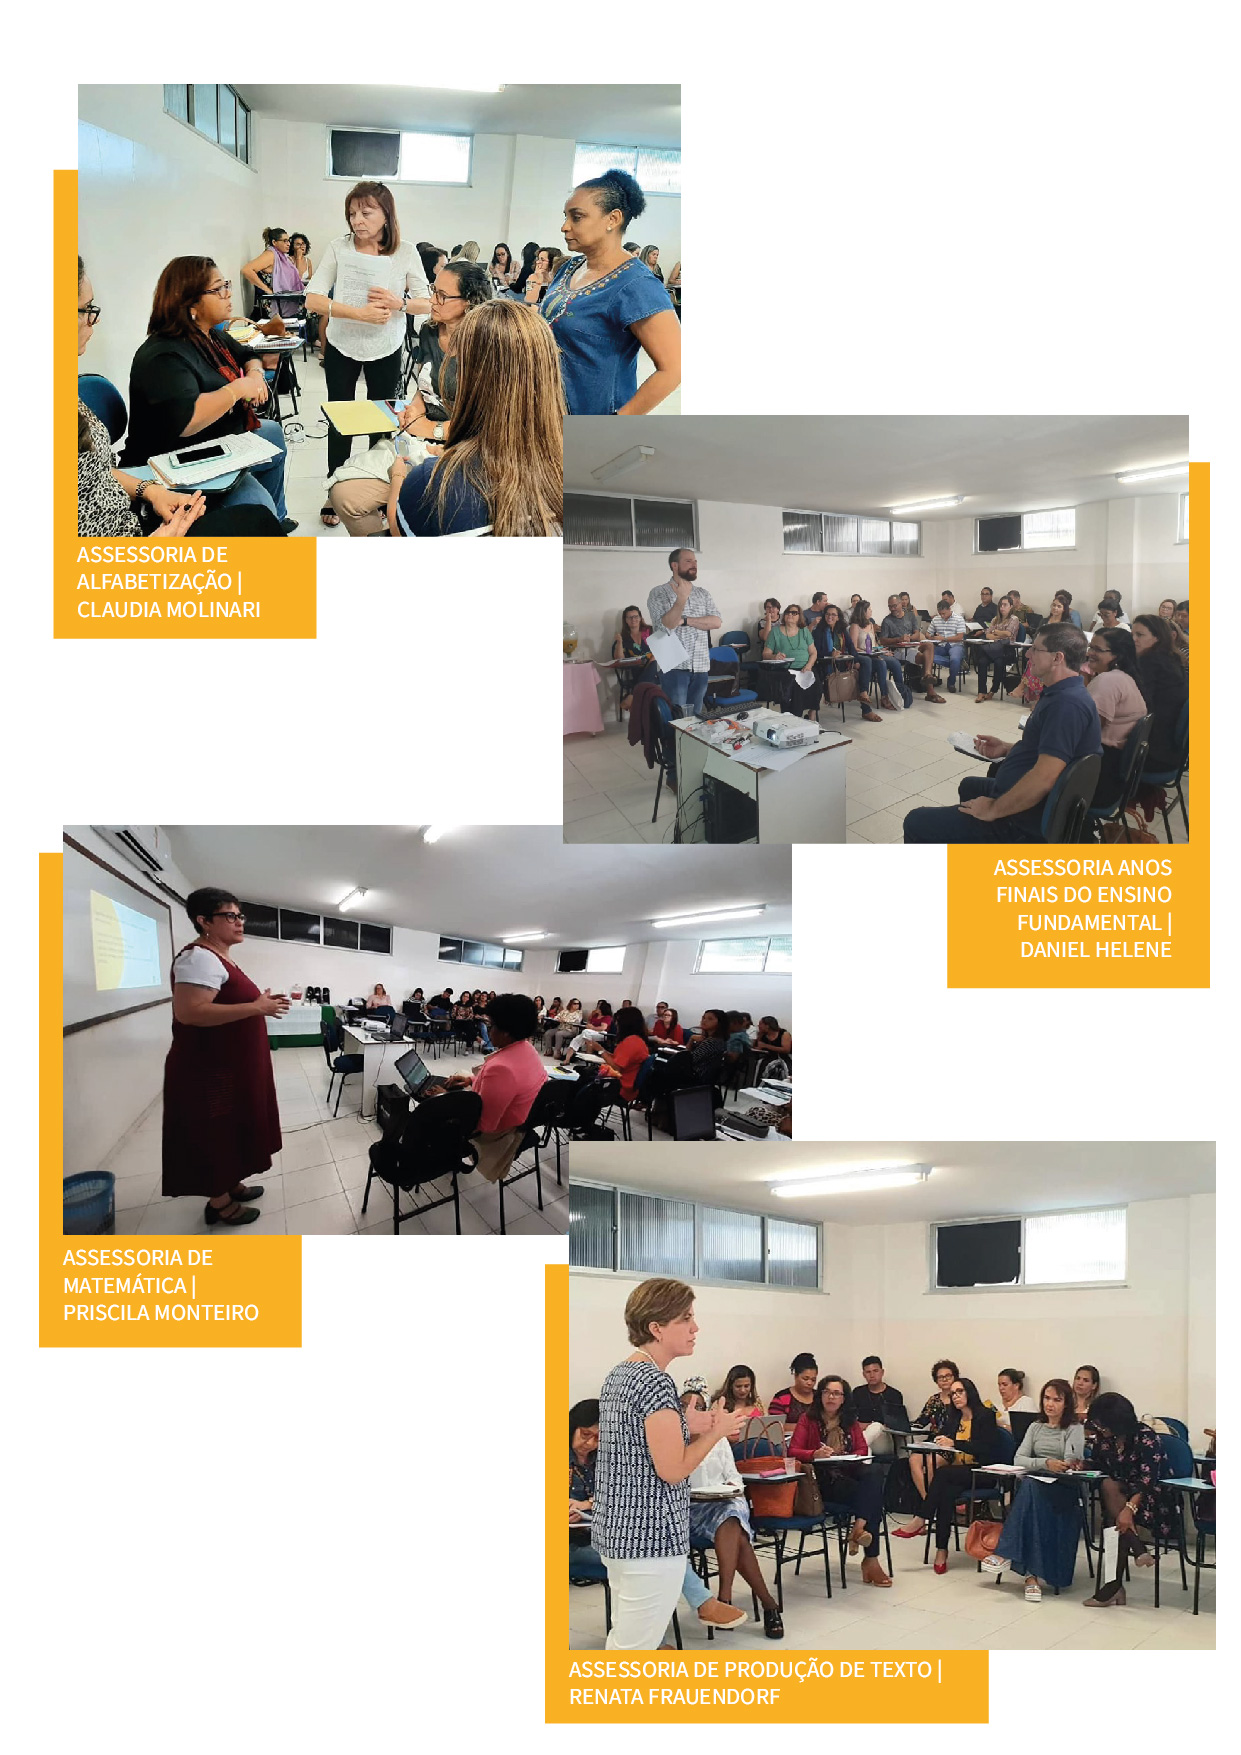 ICEP - Boletim edição 2, versão impressa_Fundo copy 15